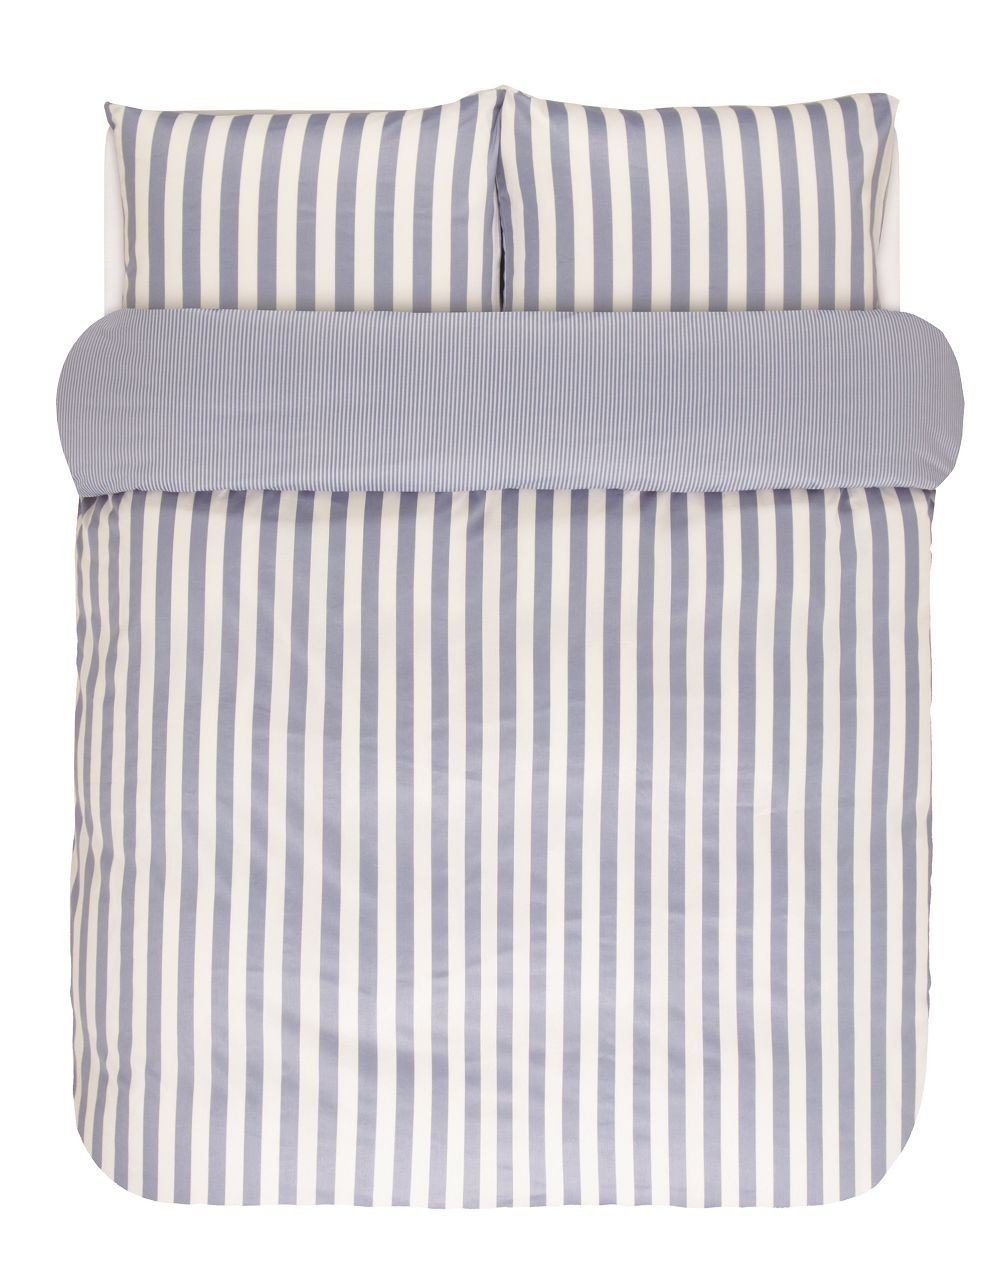 Marc O`Polo Mako Satin Bettwäsche Classic Stripes 730001-100DE-182-000-135x200-80x80 Pastel Blau